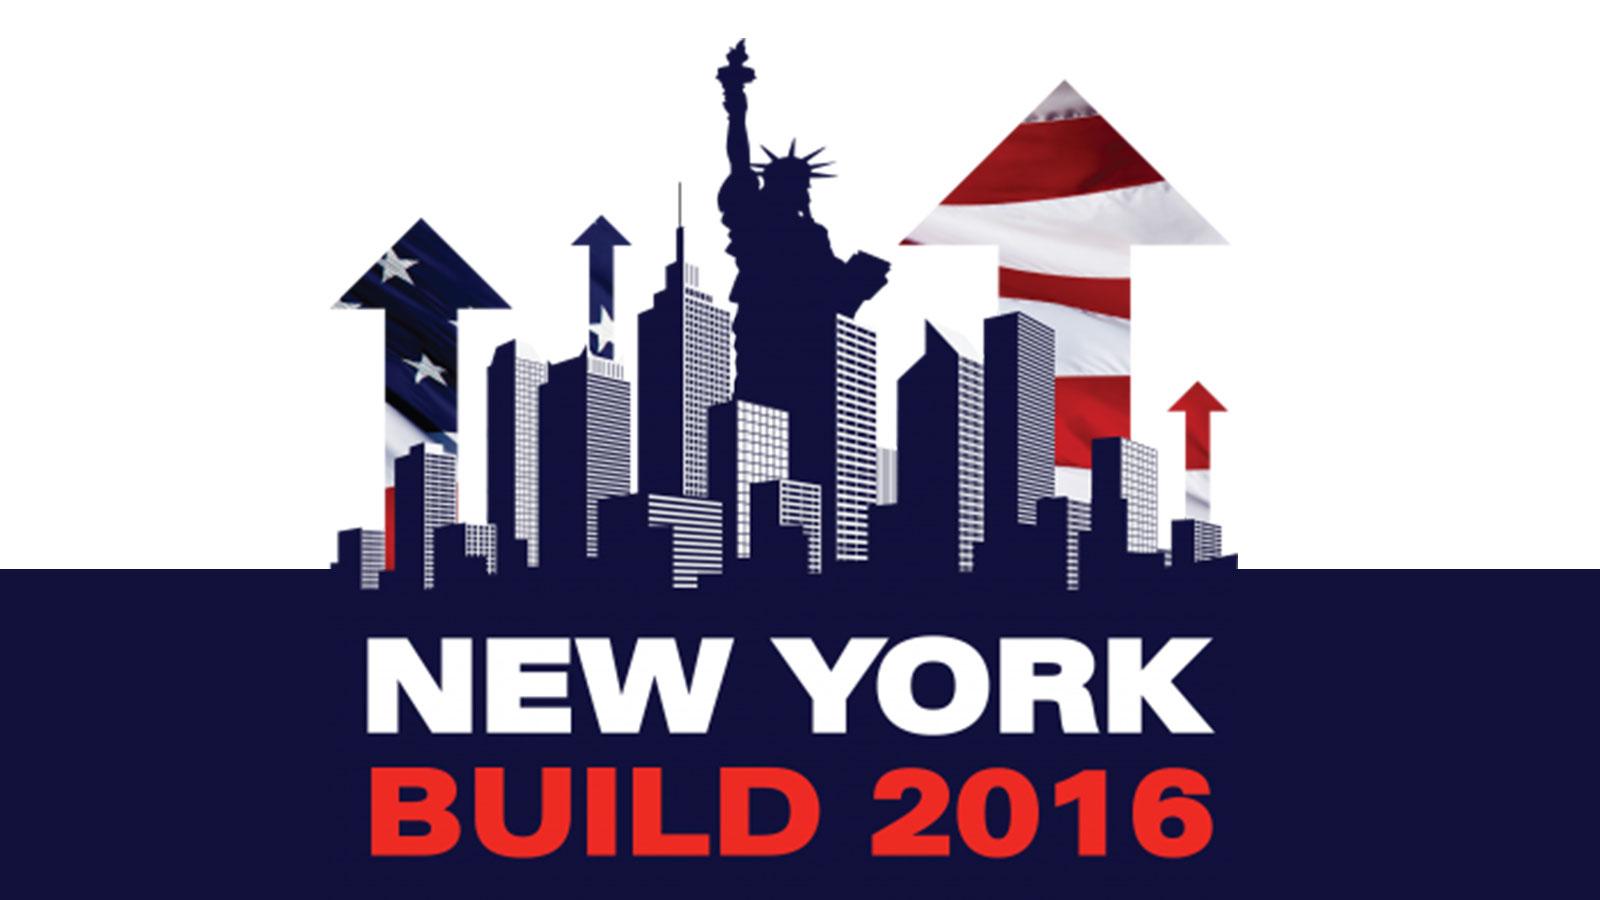 Asite to present & exhibit at New York Build